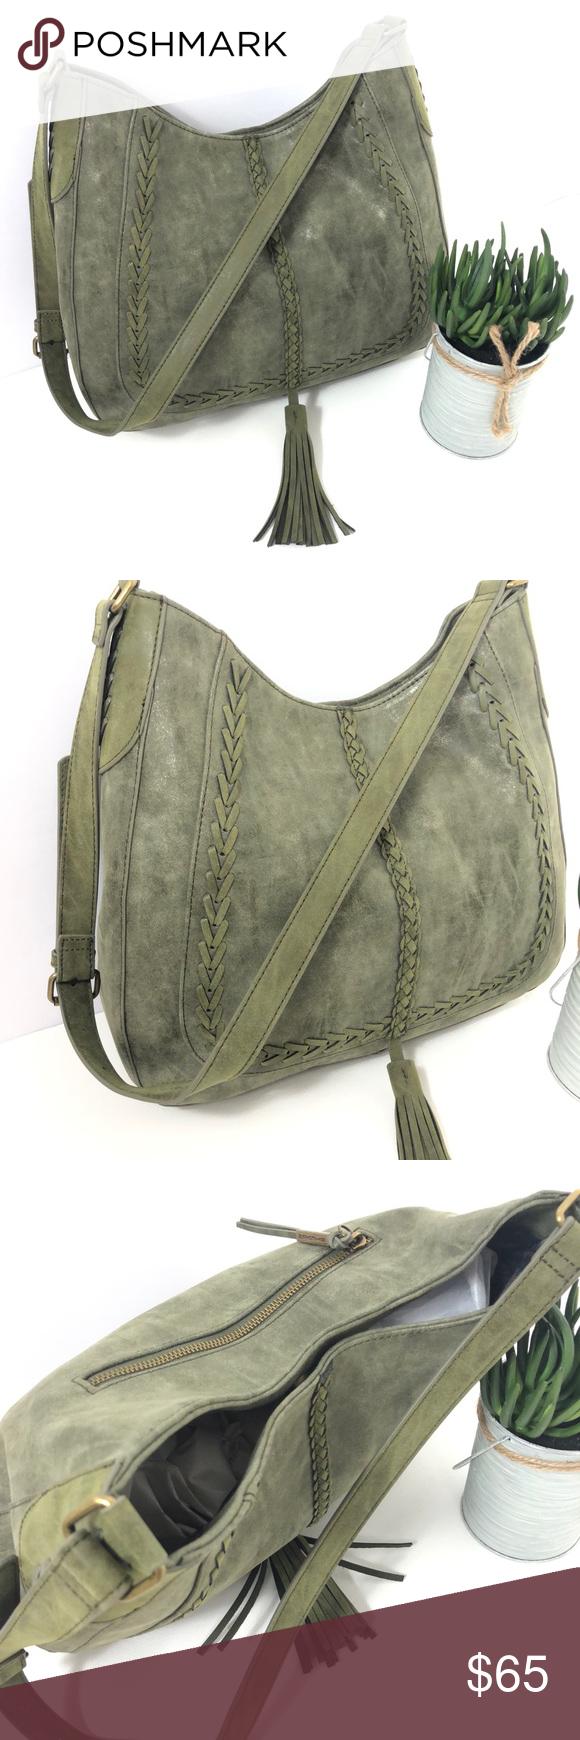 2ee3fb8ec5 Steve Madden Large shoulder bag Olive green Woven stitching details loop  about a faux suede finish